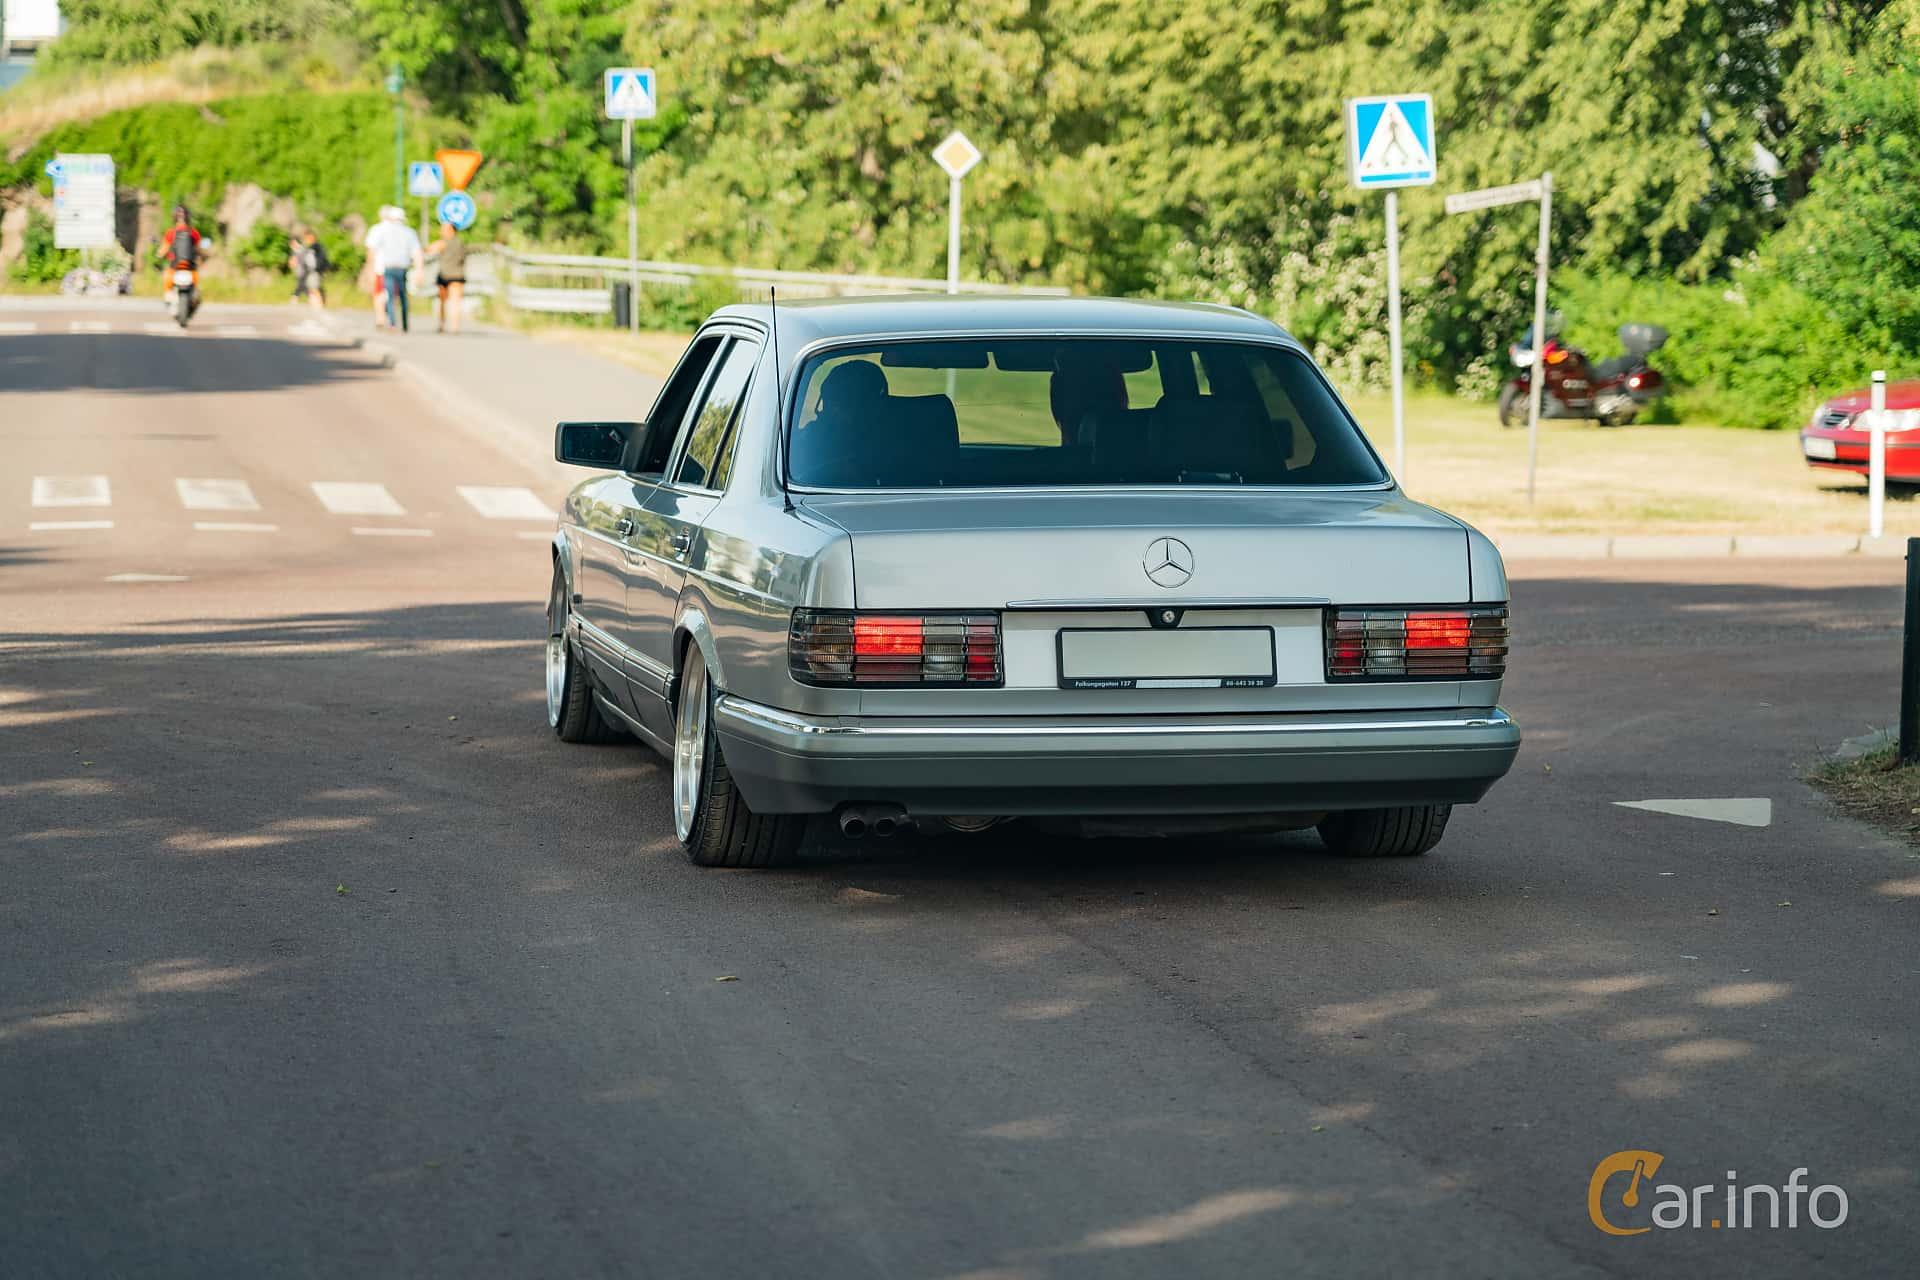 Mercedes-Benz 420 SE  Automatisk, 224hk, 1990 at Ronneby Nostalgia Festival 2019